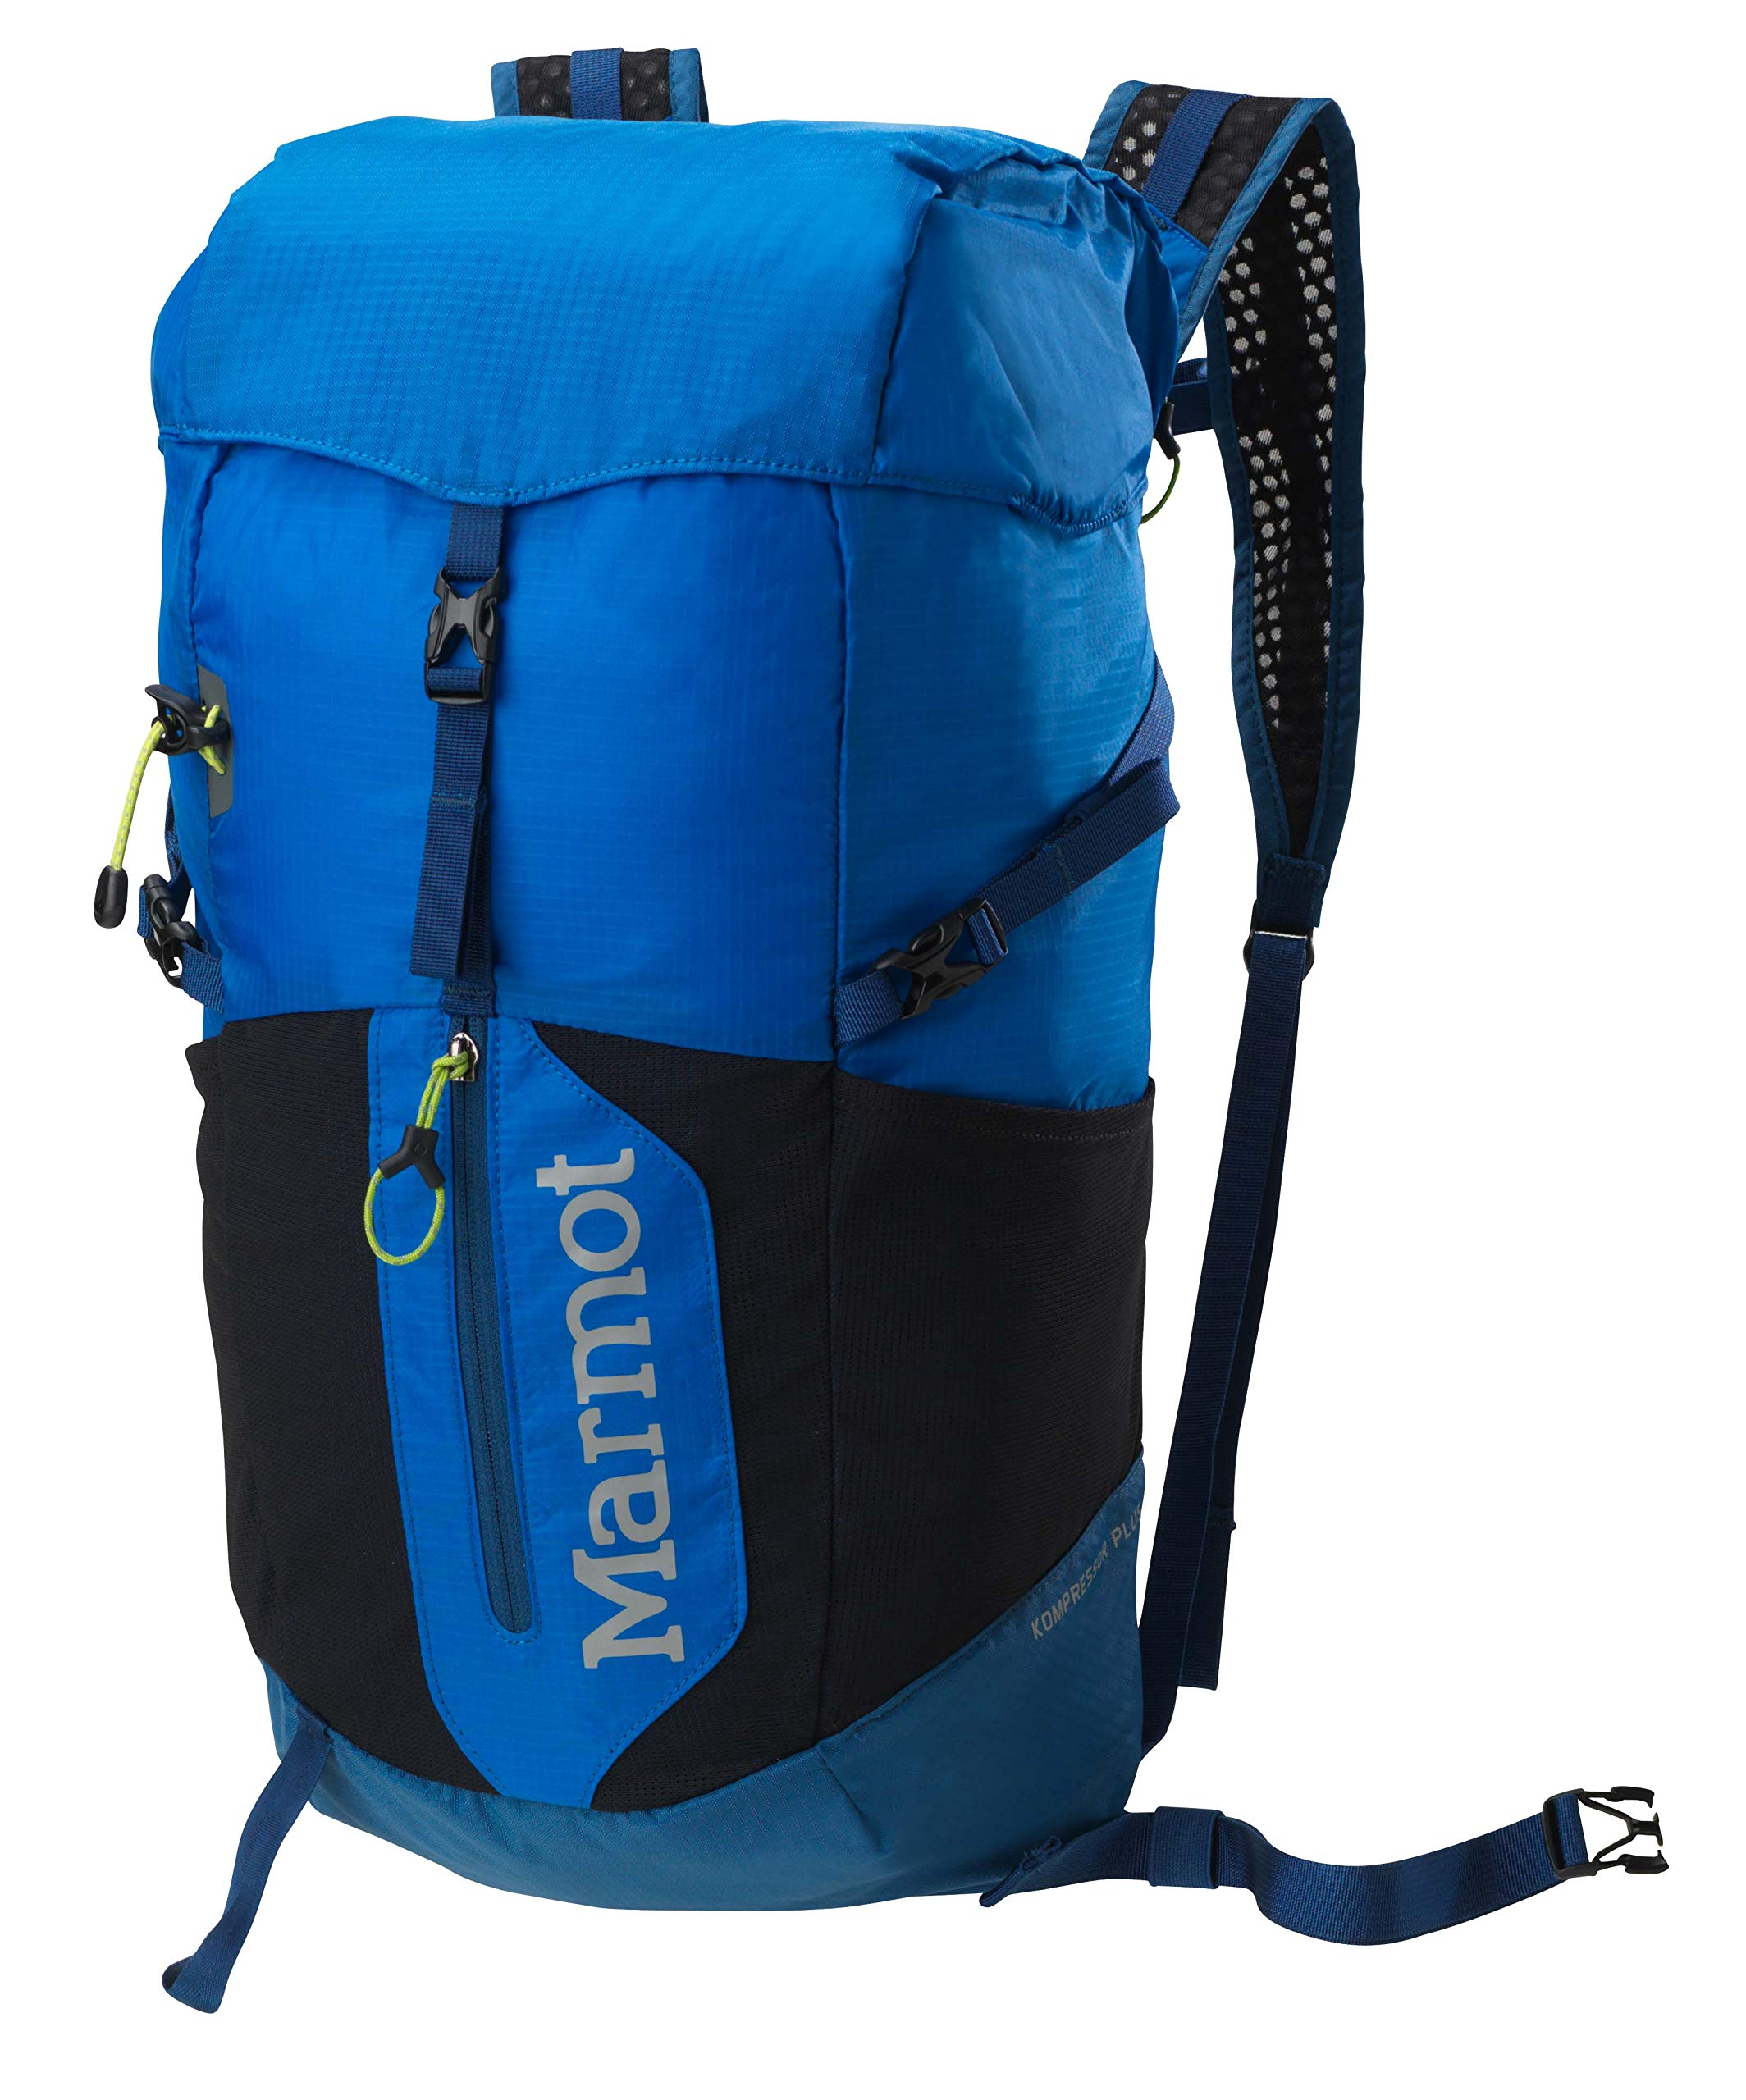 Marmot Kompressor Plus Lightweight Hiking Backpack, Peak Blue/Dark Sapphire by Marmot